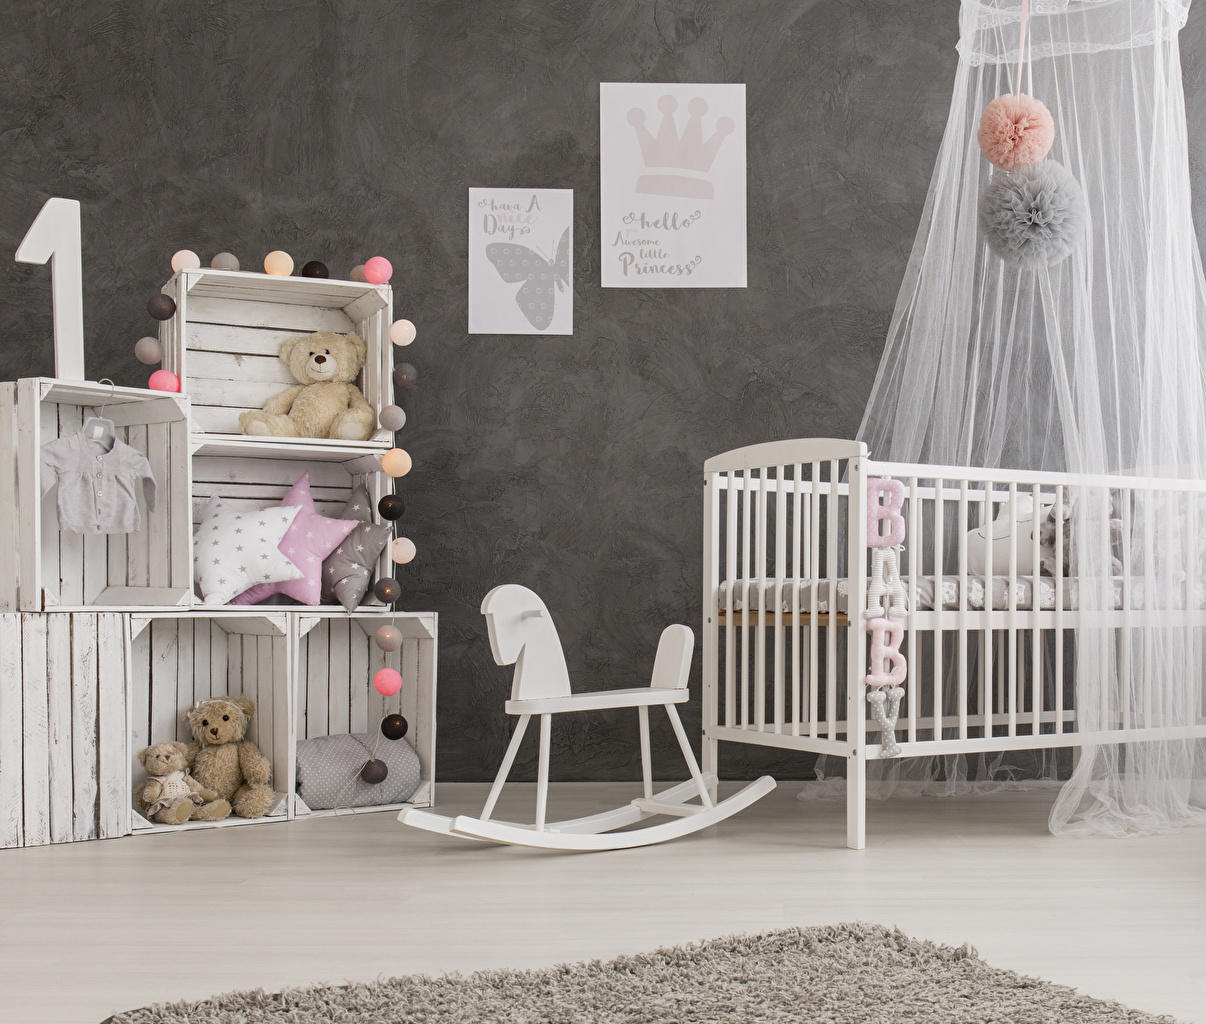 Bilder Kinderzimmer Teddy Innenarchitektur Spielzeuge Design Teddybär Knuddelbär